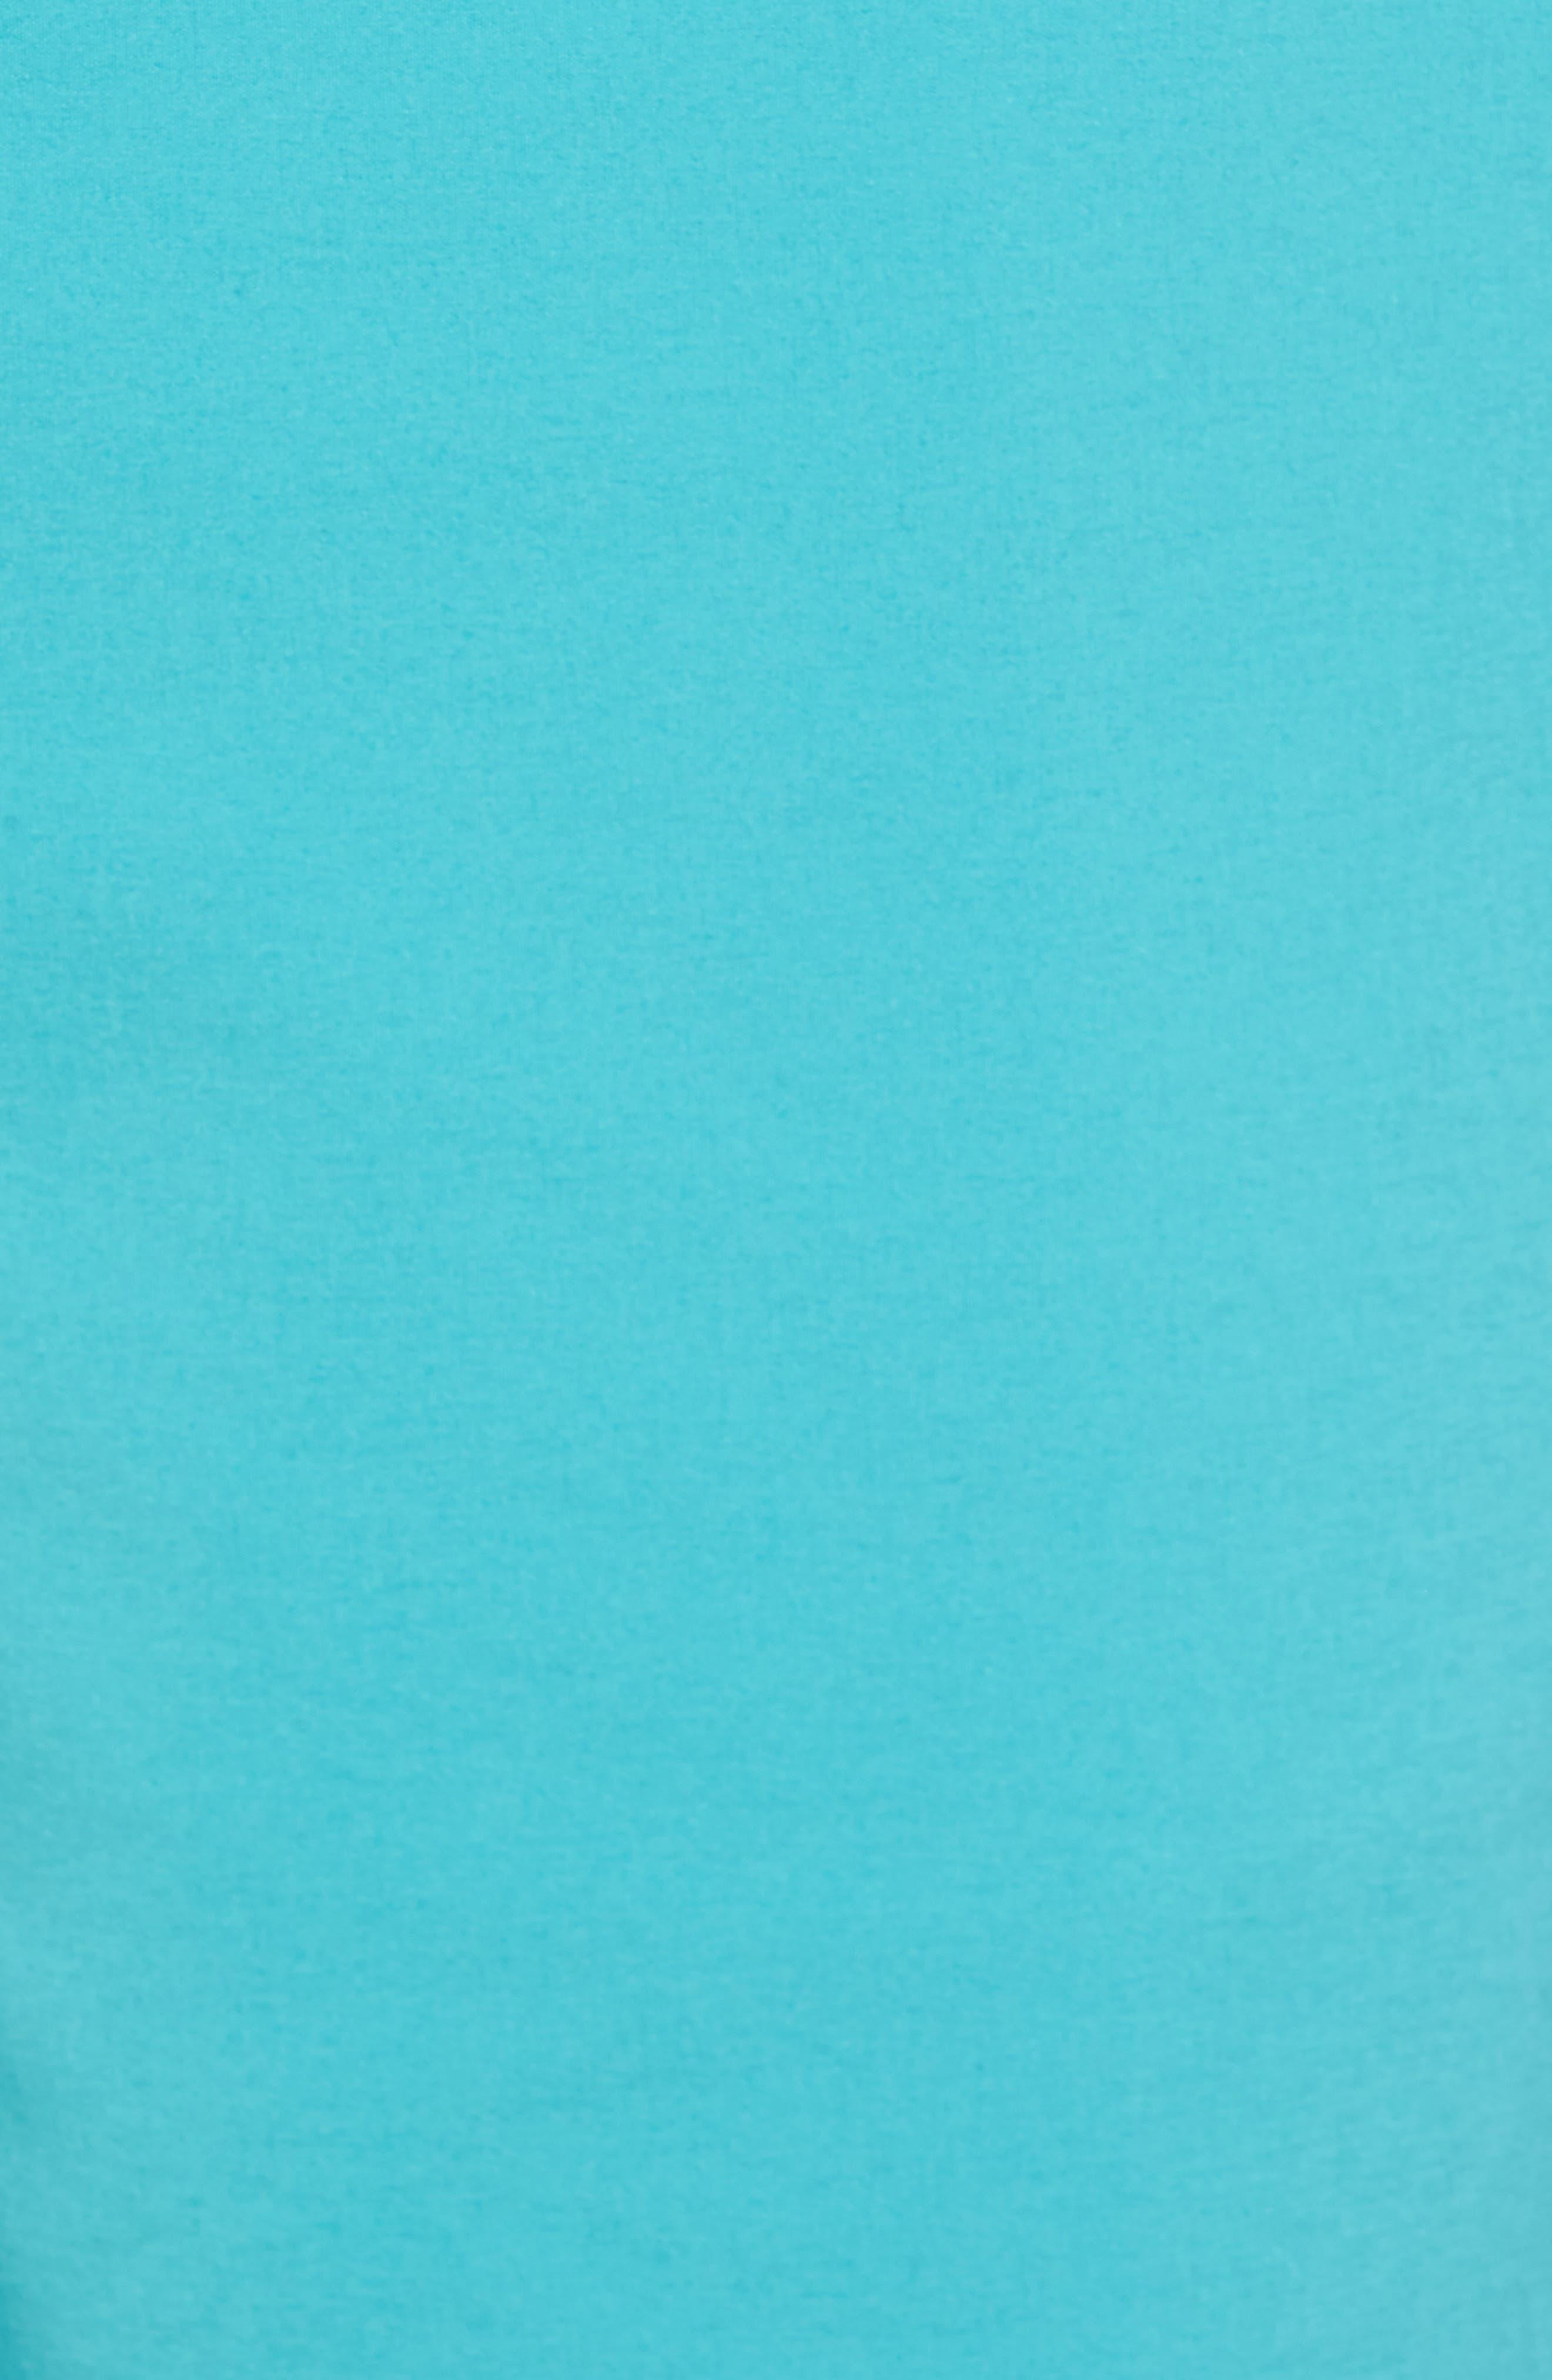 PFG Grander Marlin II Shorts,                             Alternate thumbnail 5, color,                             440